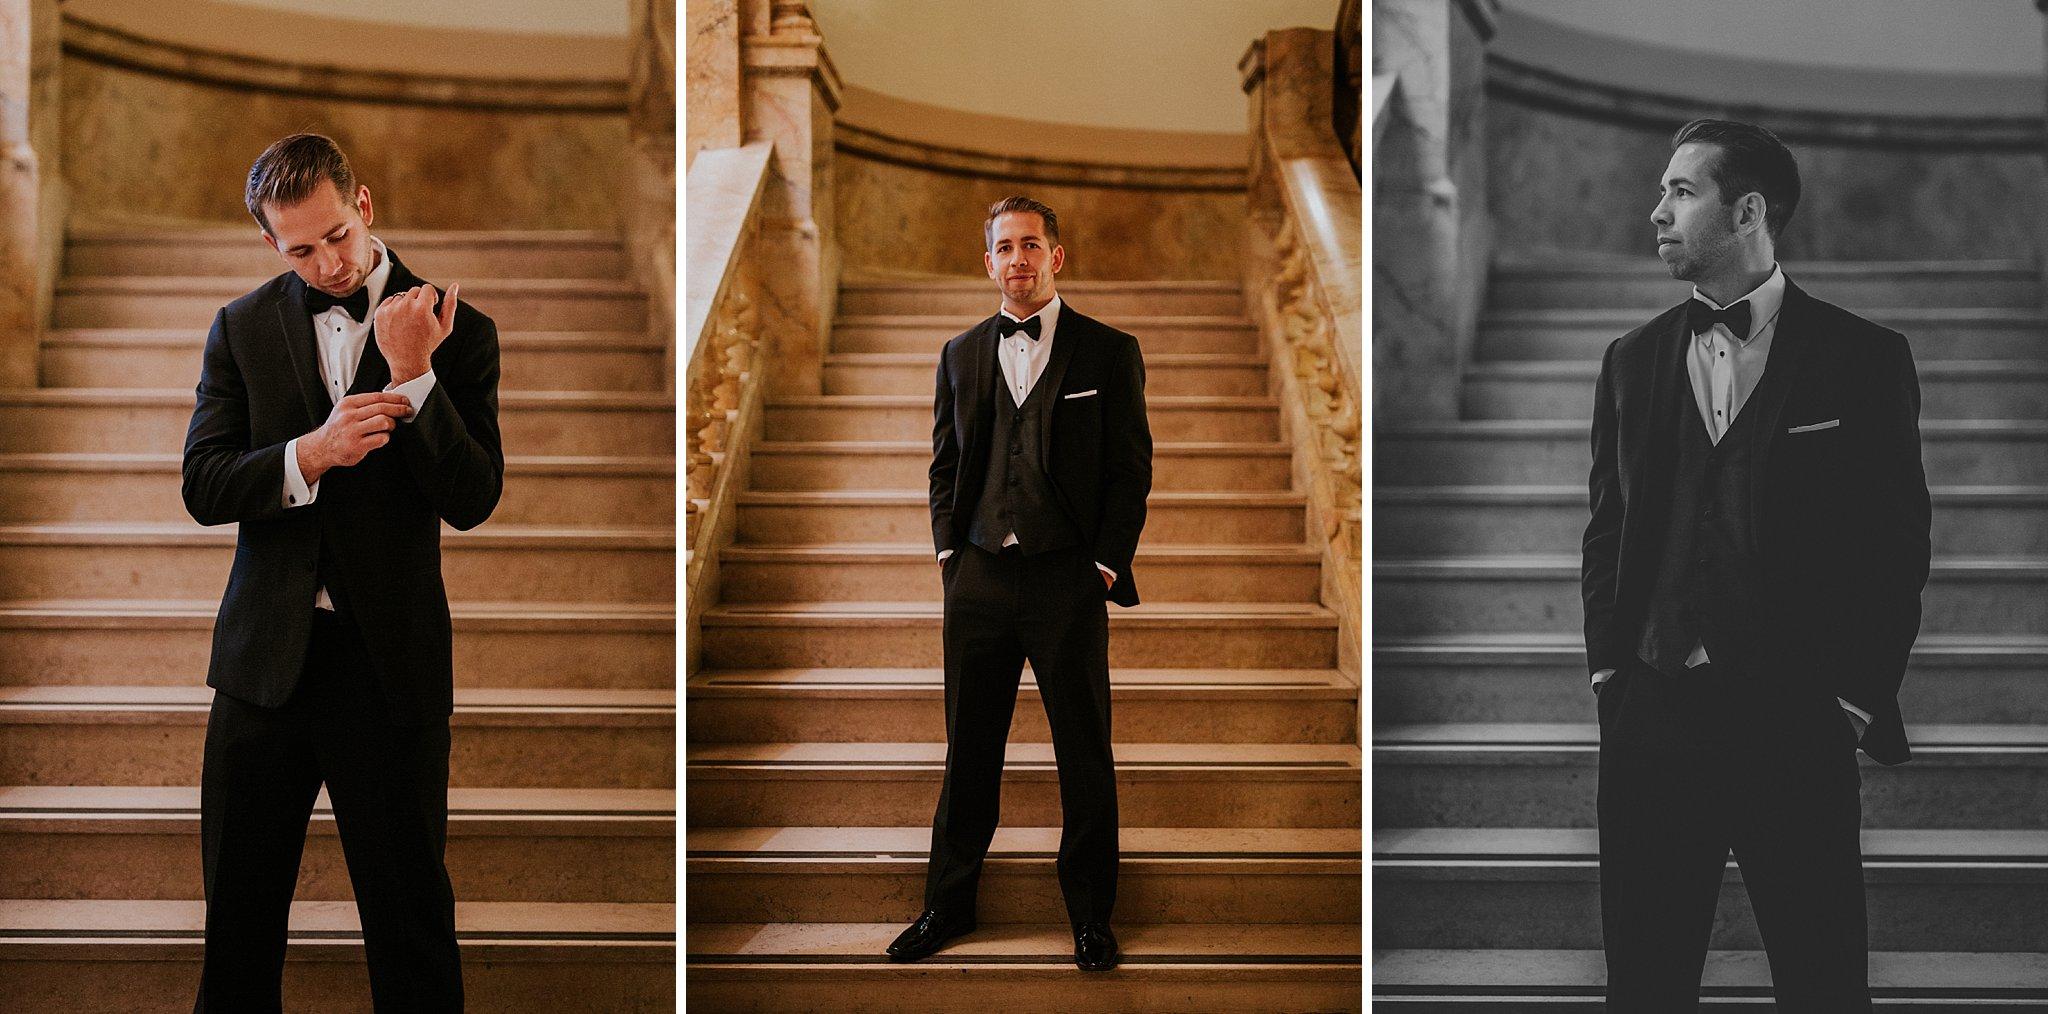 Matt-Lauren_St-Marys_Hilton-City-Center-Milwaukee-Wedding_liller-photo_0056.jpg